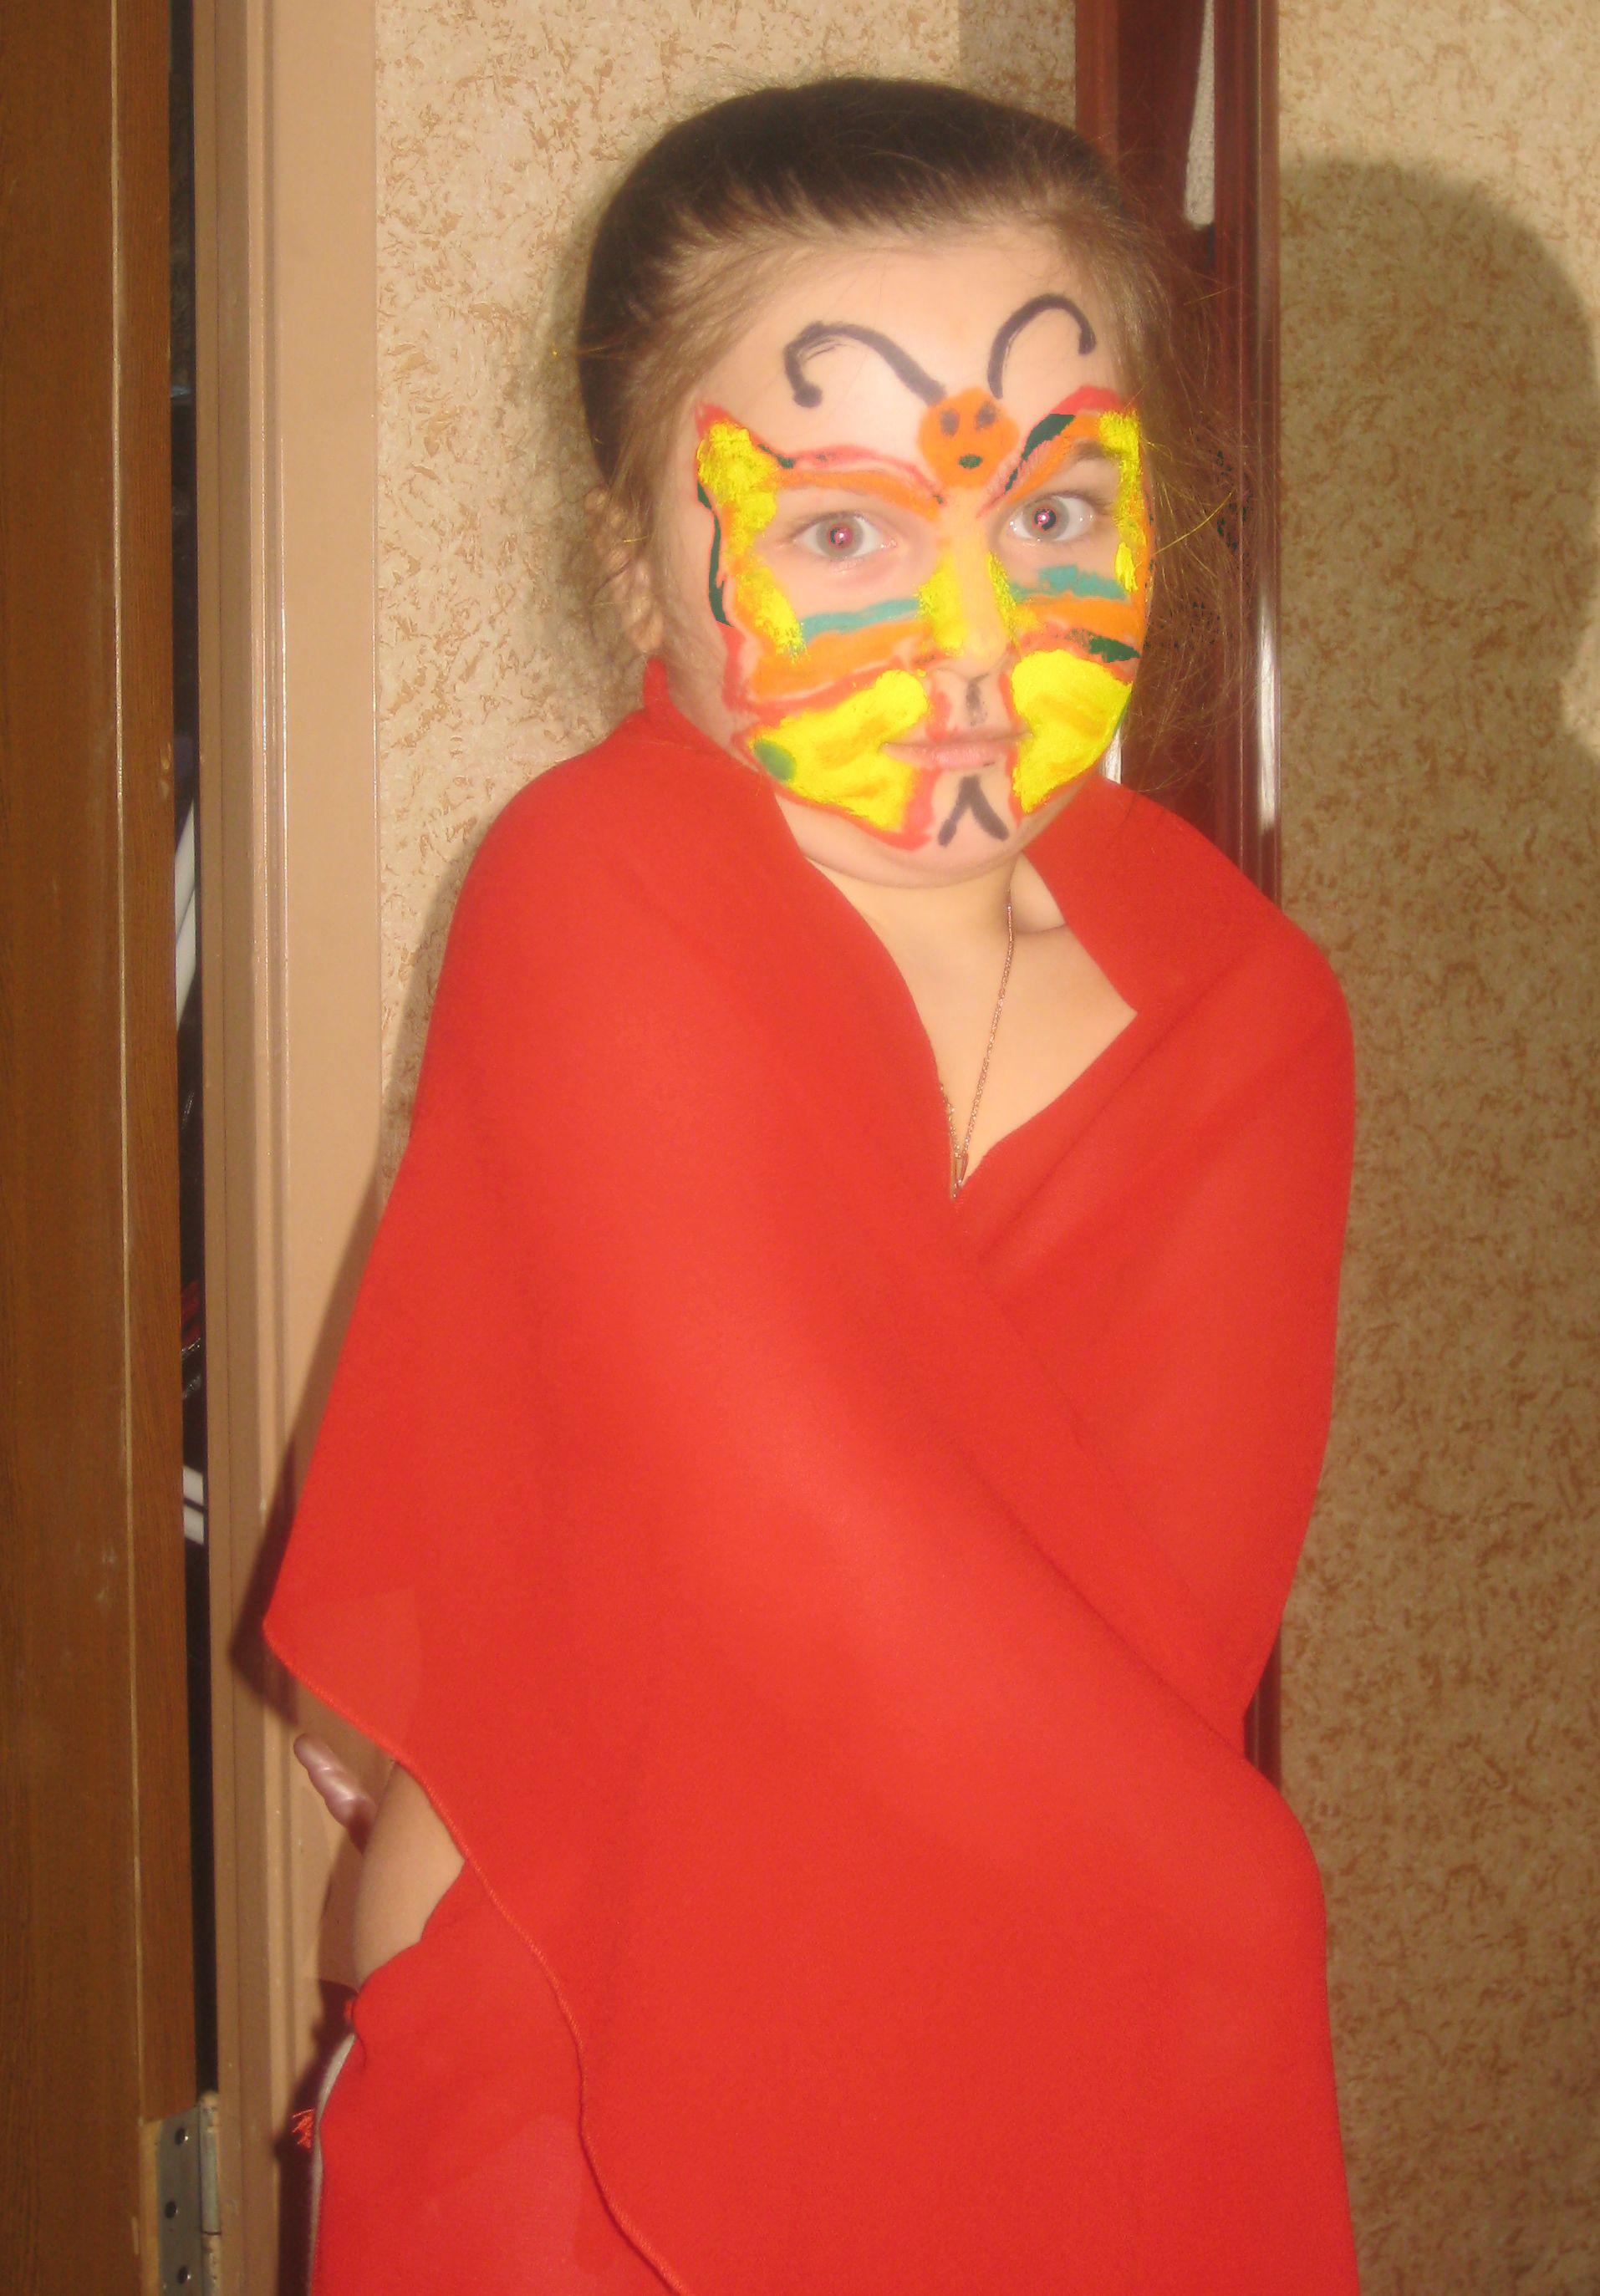 мам, я похожа на бабочку?. Я рисую